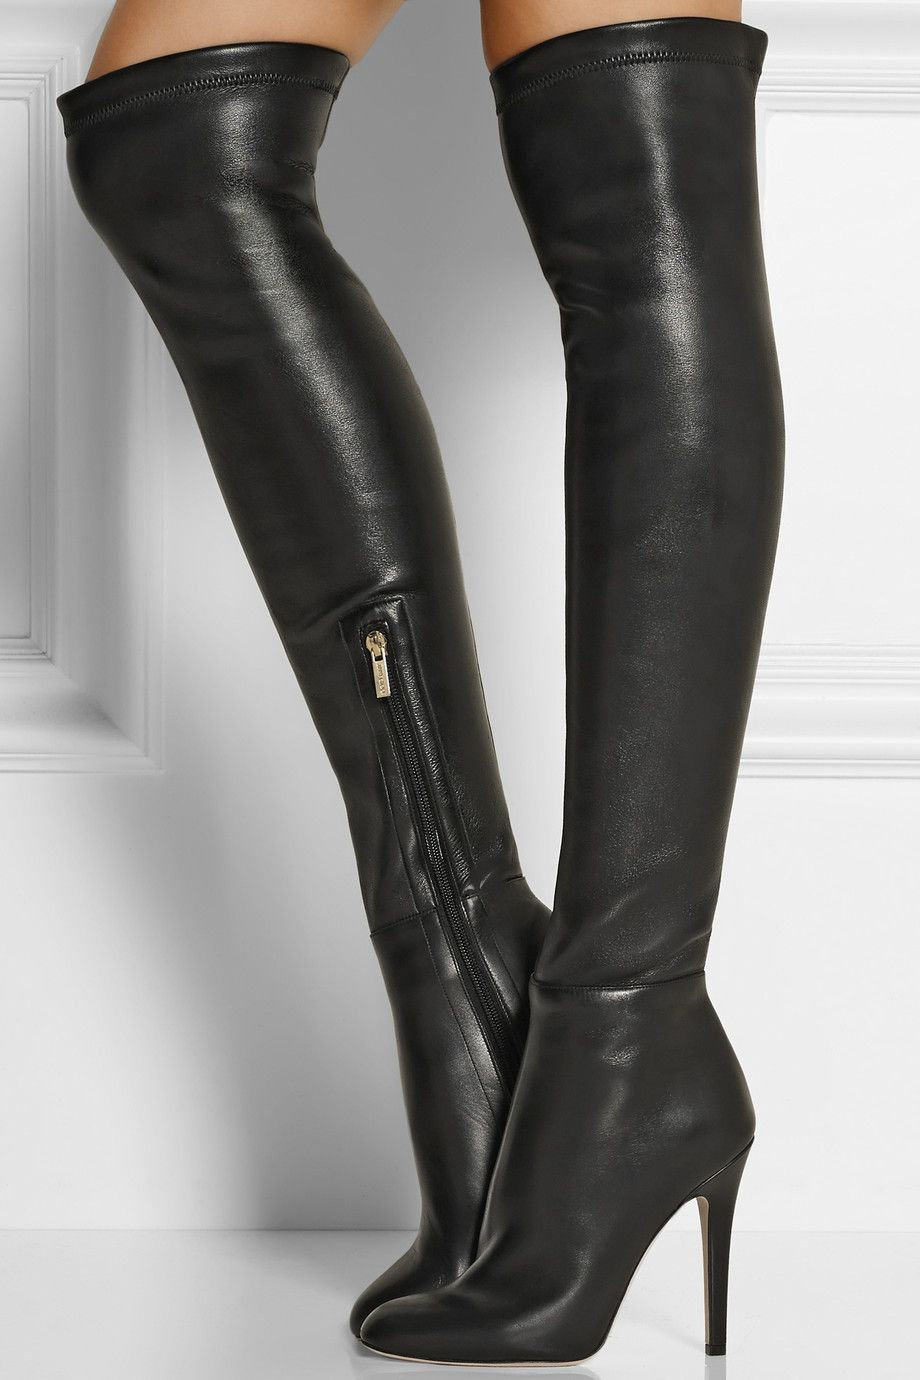 Hot Sale Womens Jimmy Choo 'toni' Thigh High Boots Wonderful